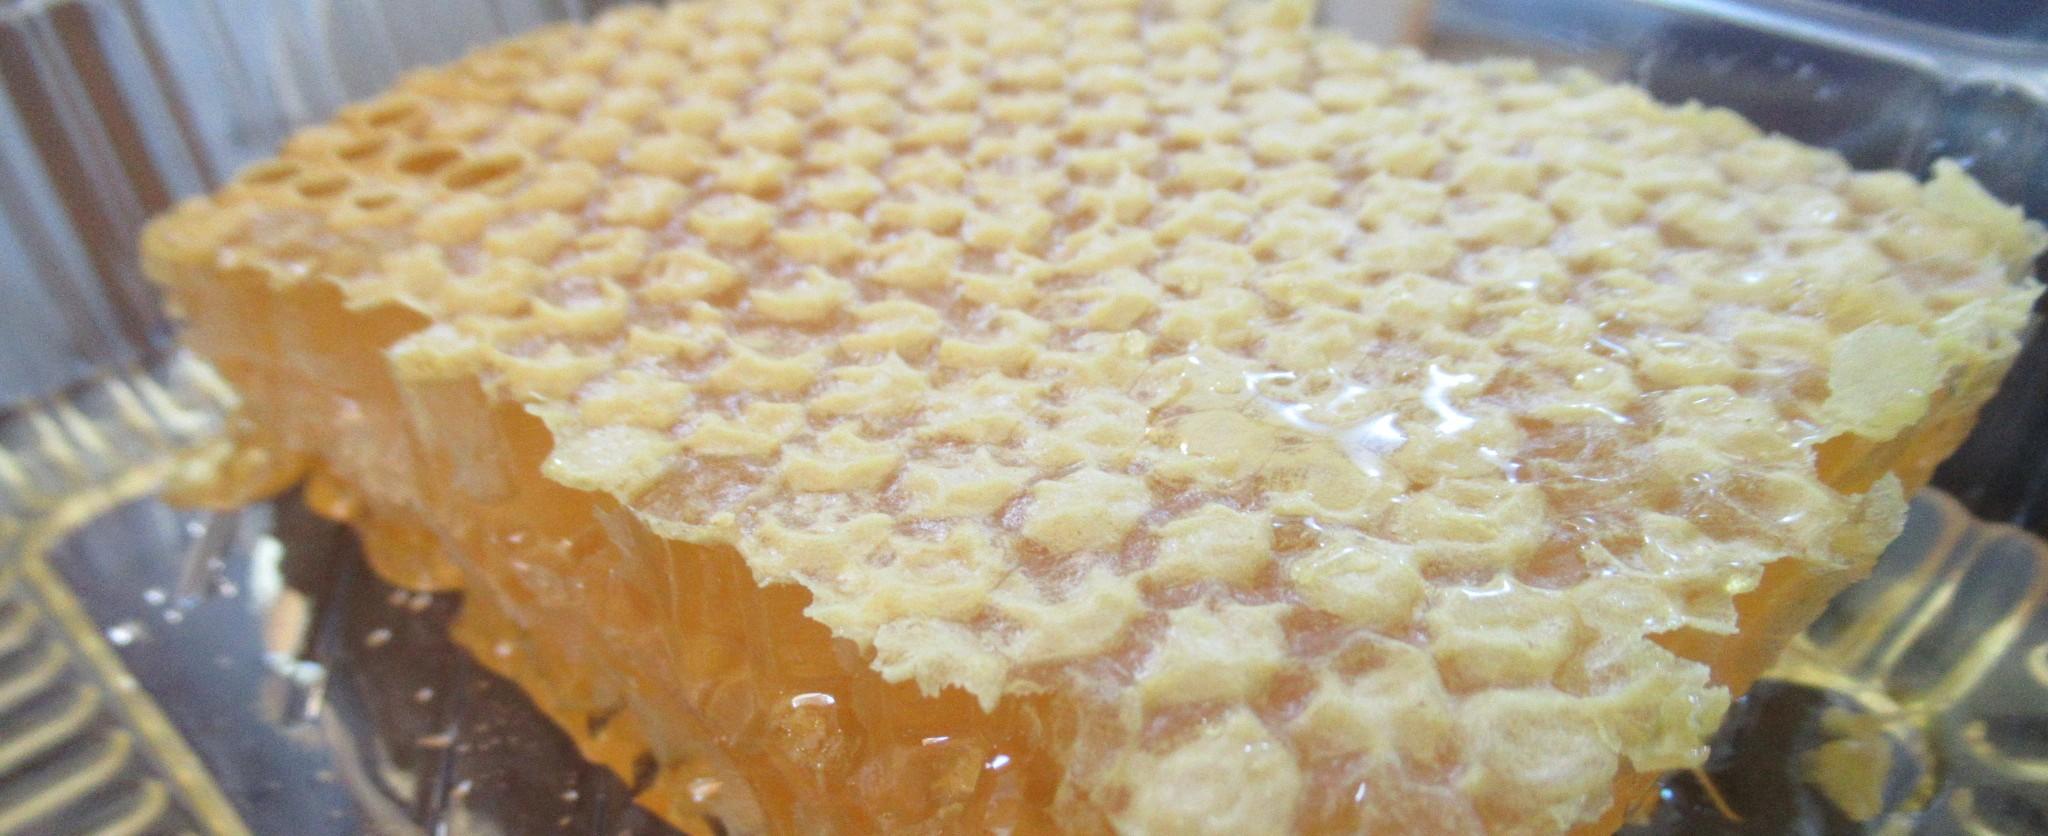 Gifford's Honey Farm